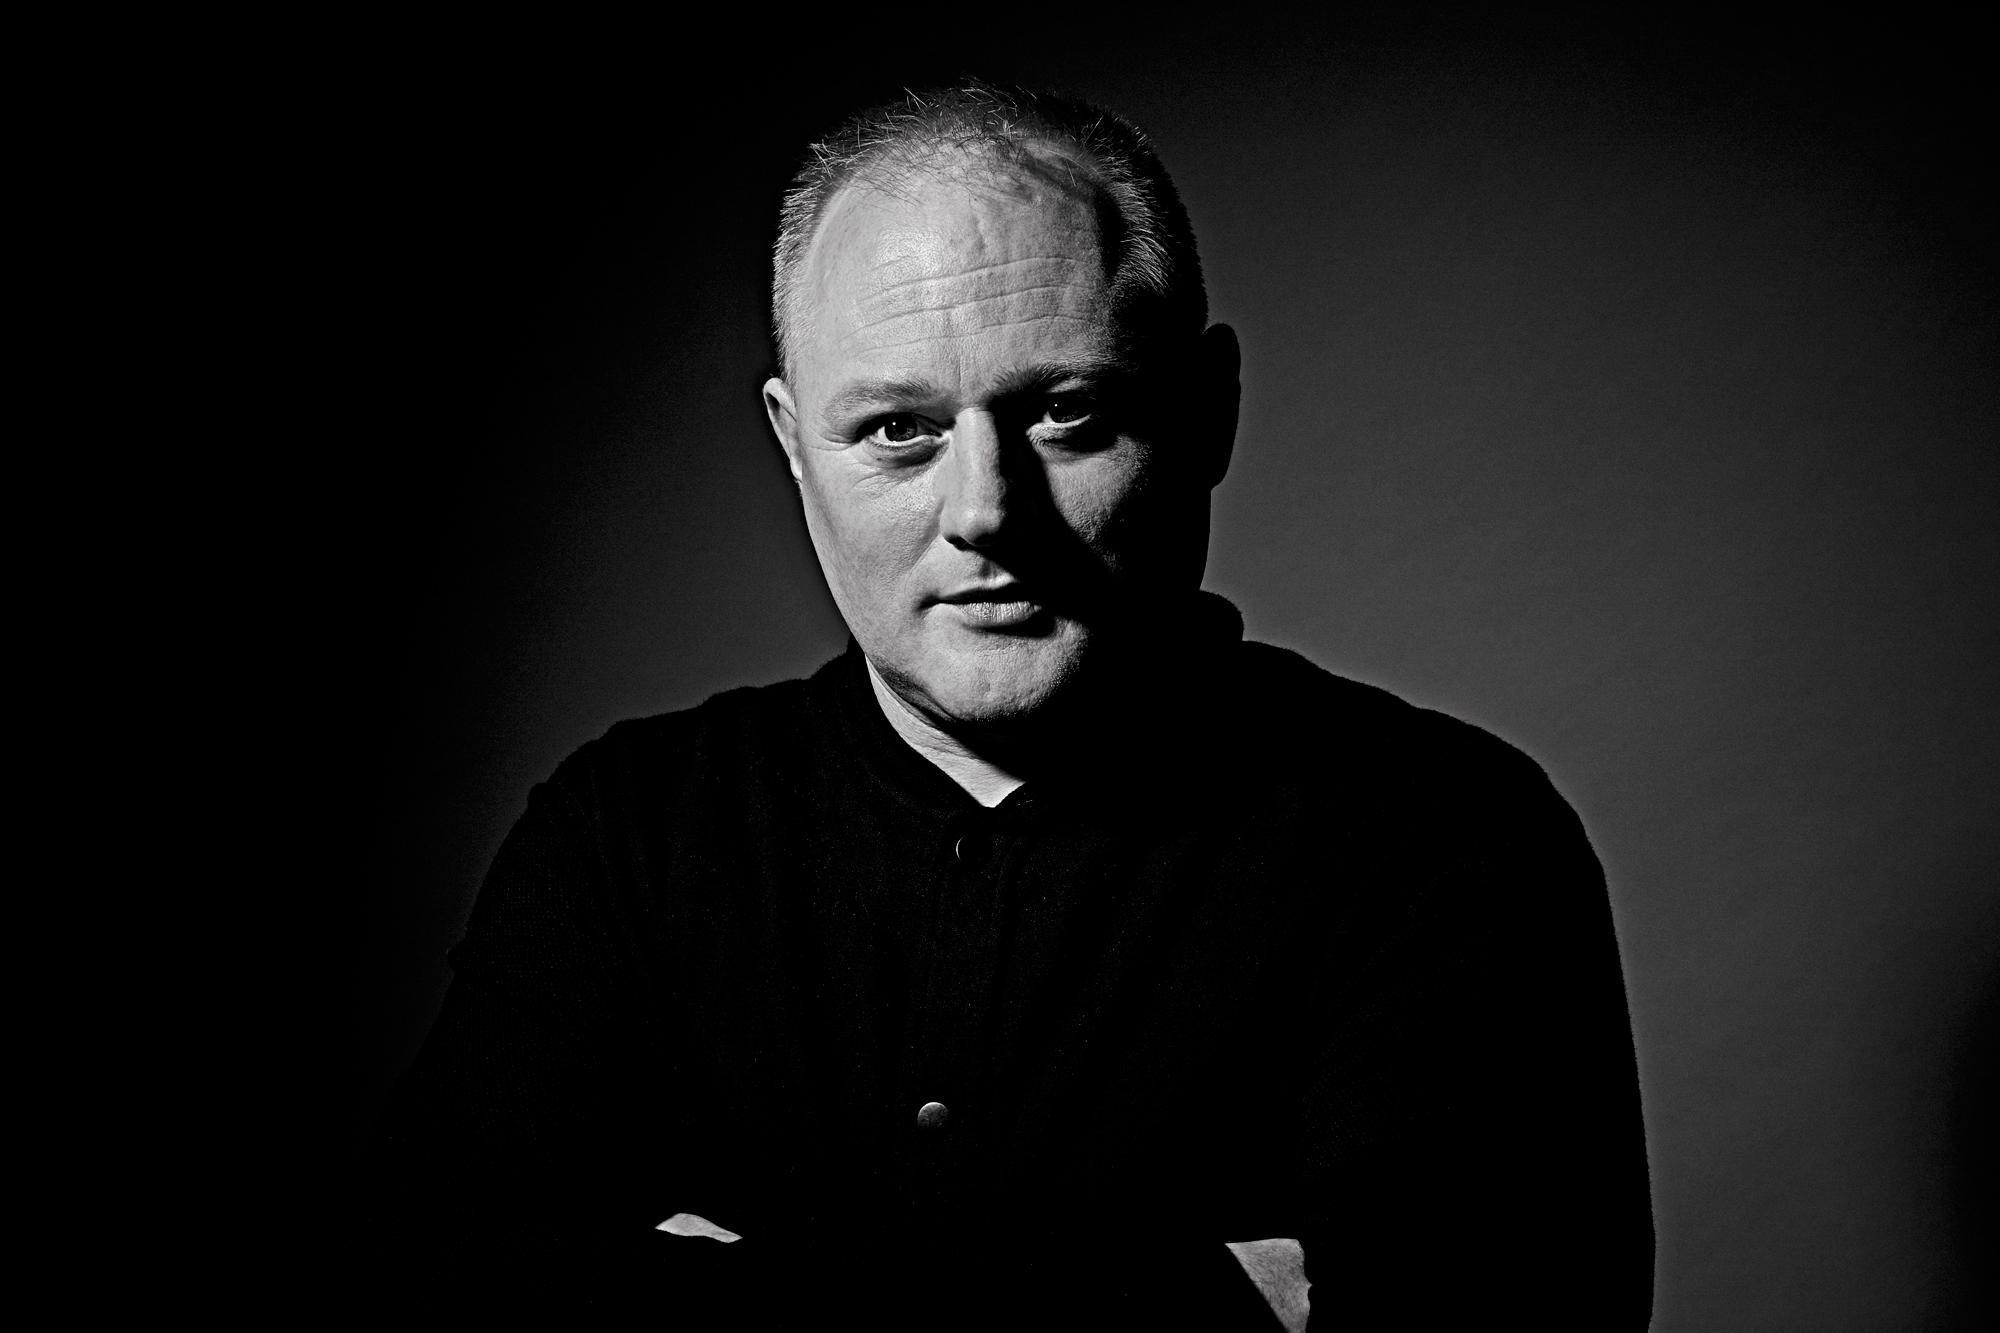 Uwe - Photo: Markus Jäger